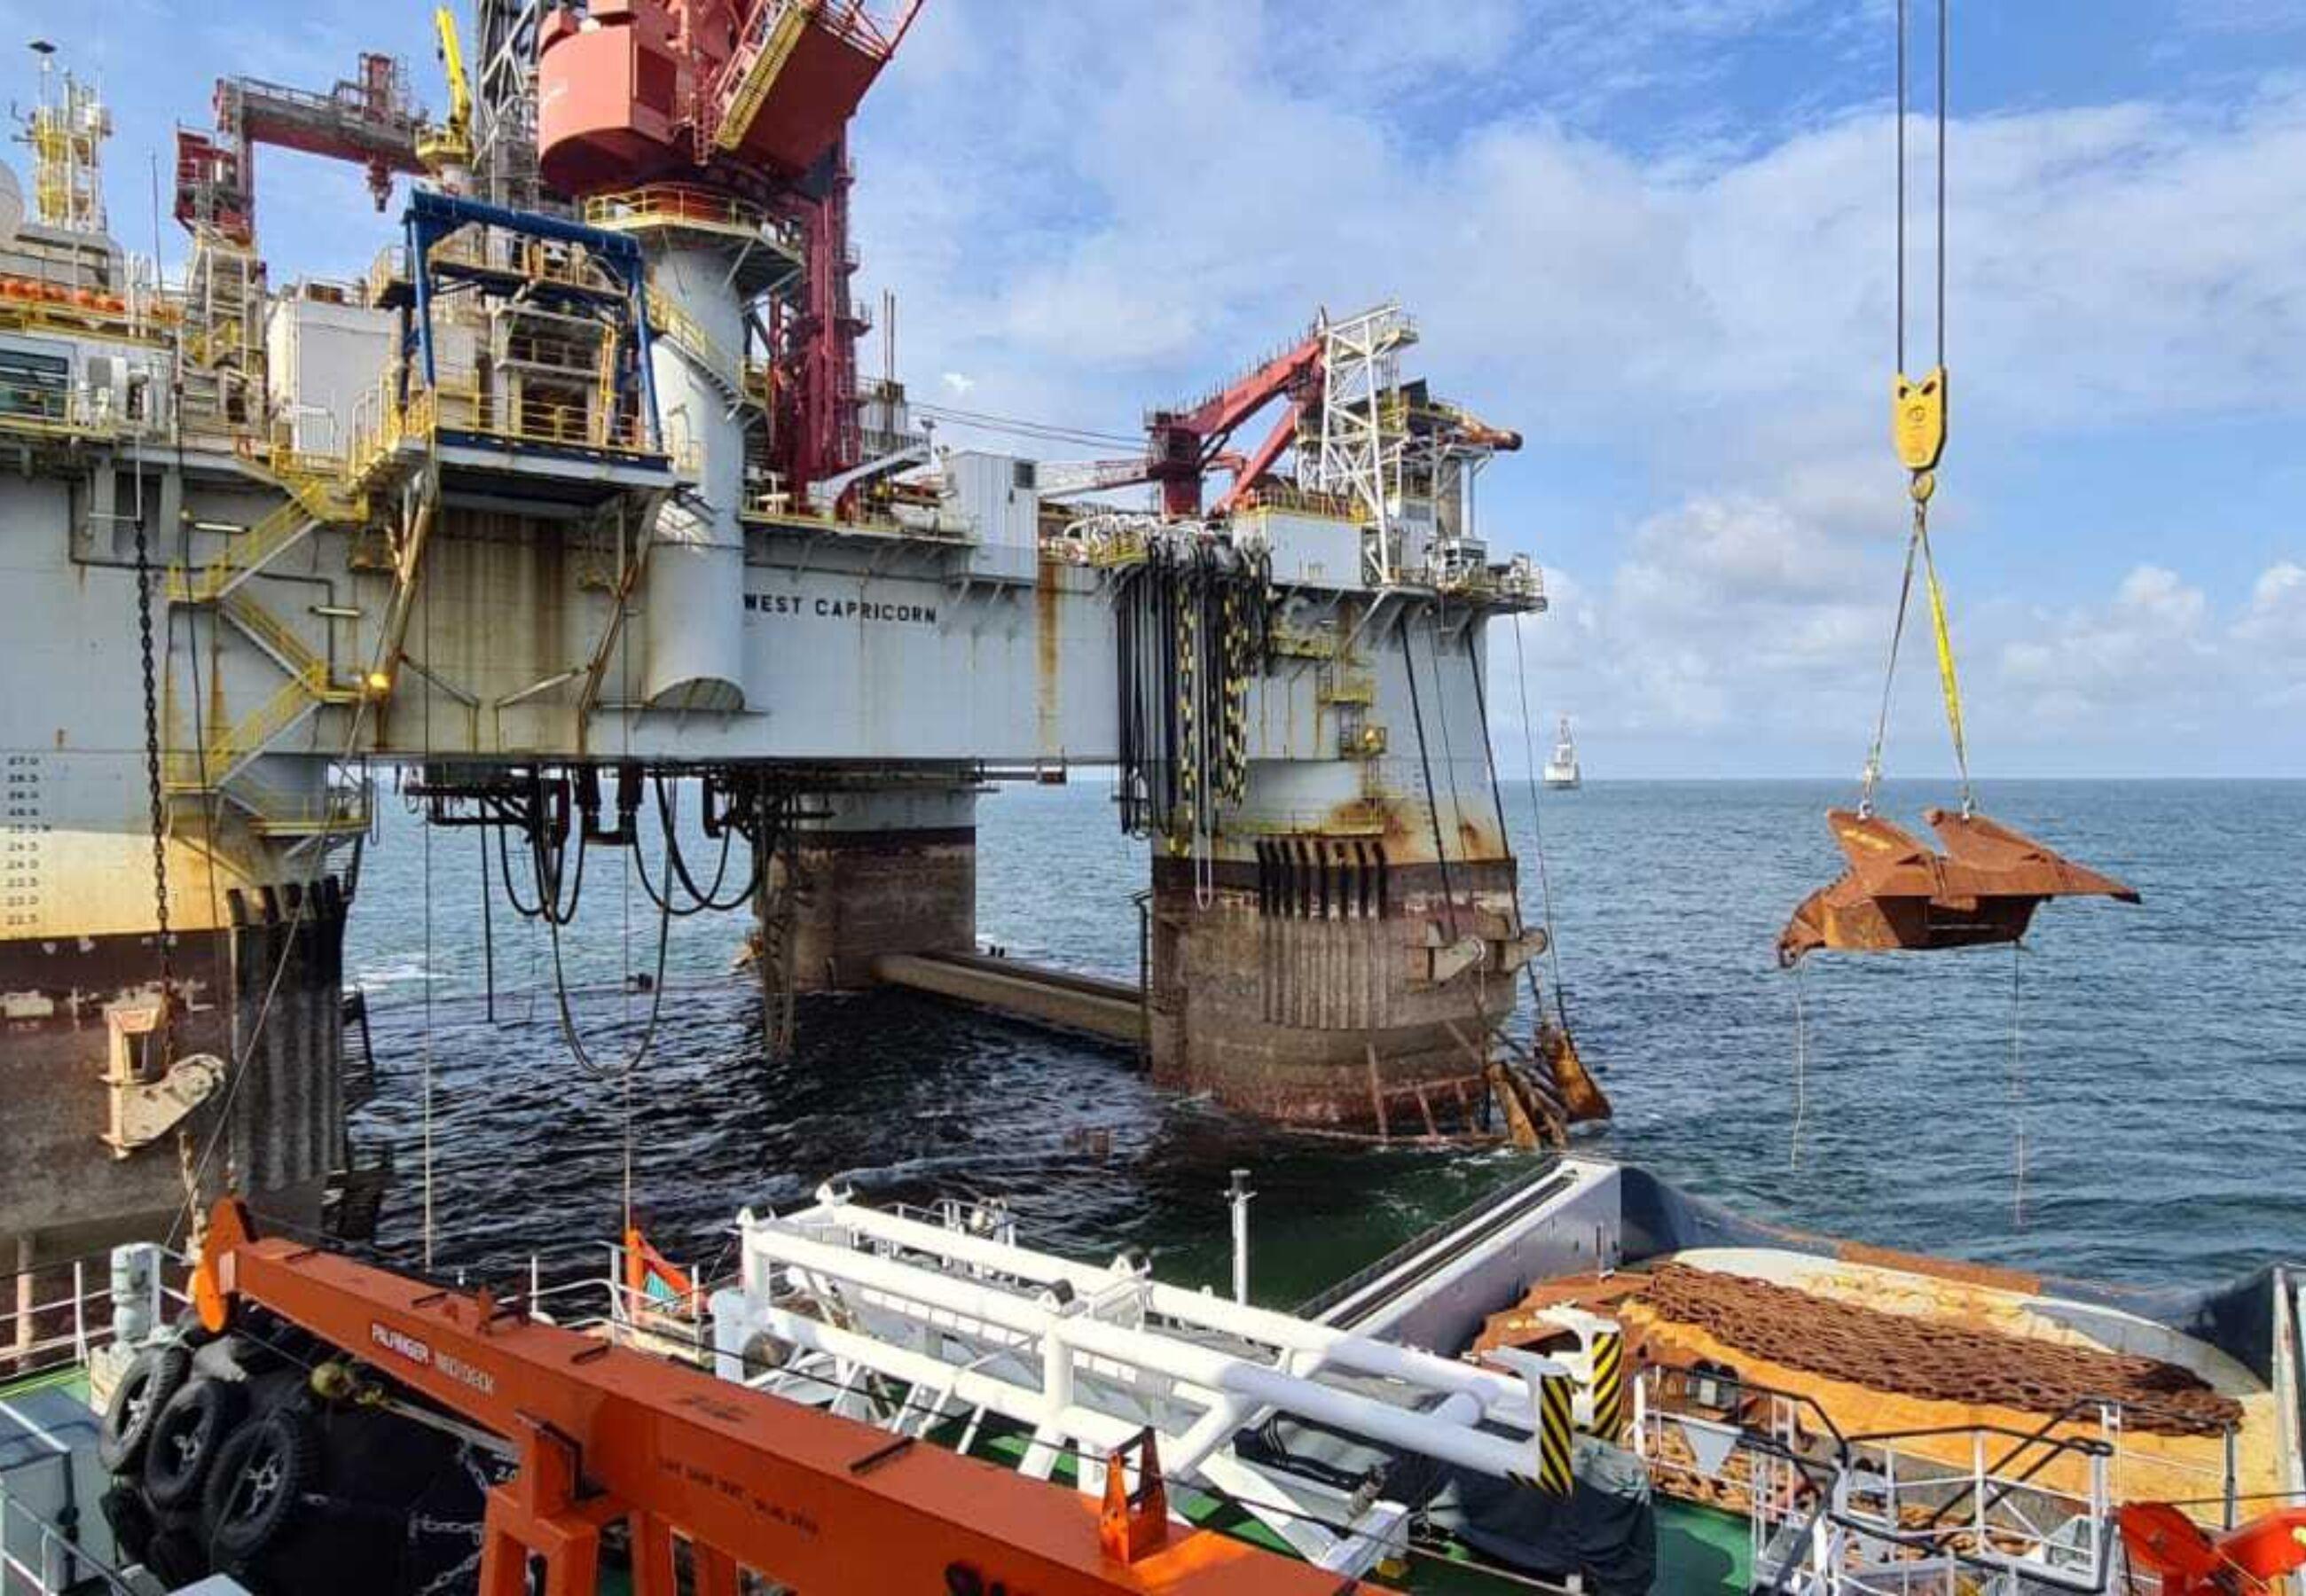 CS Striker Capricorn project offloading anchors